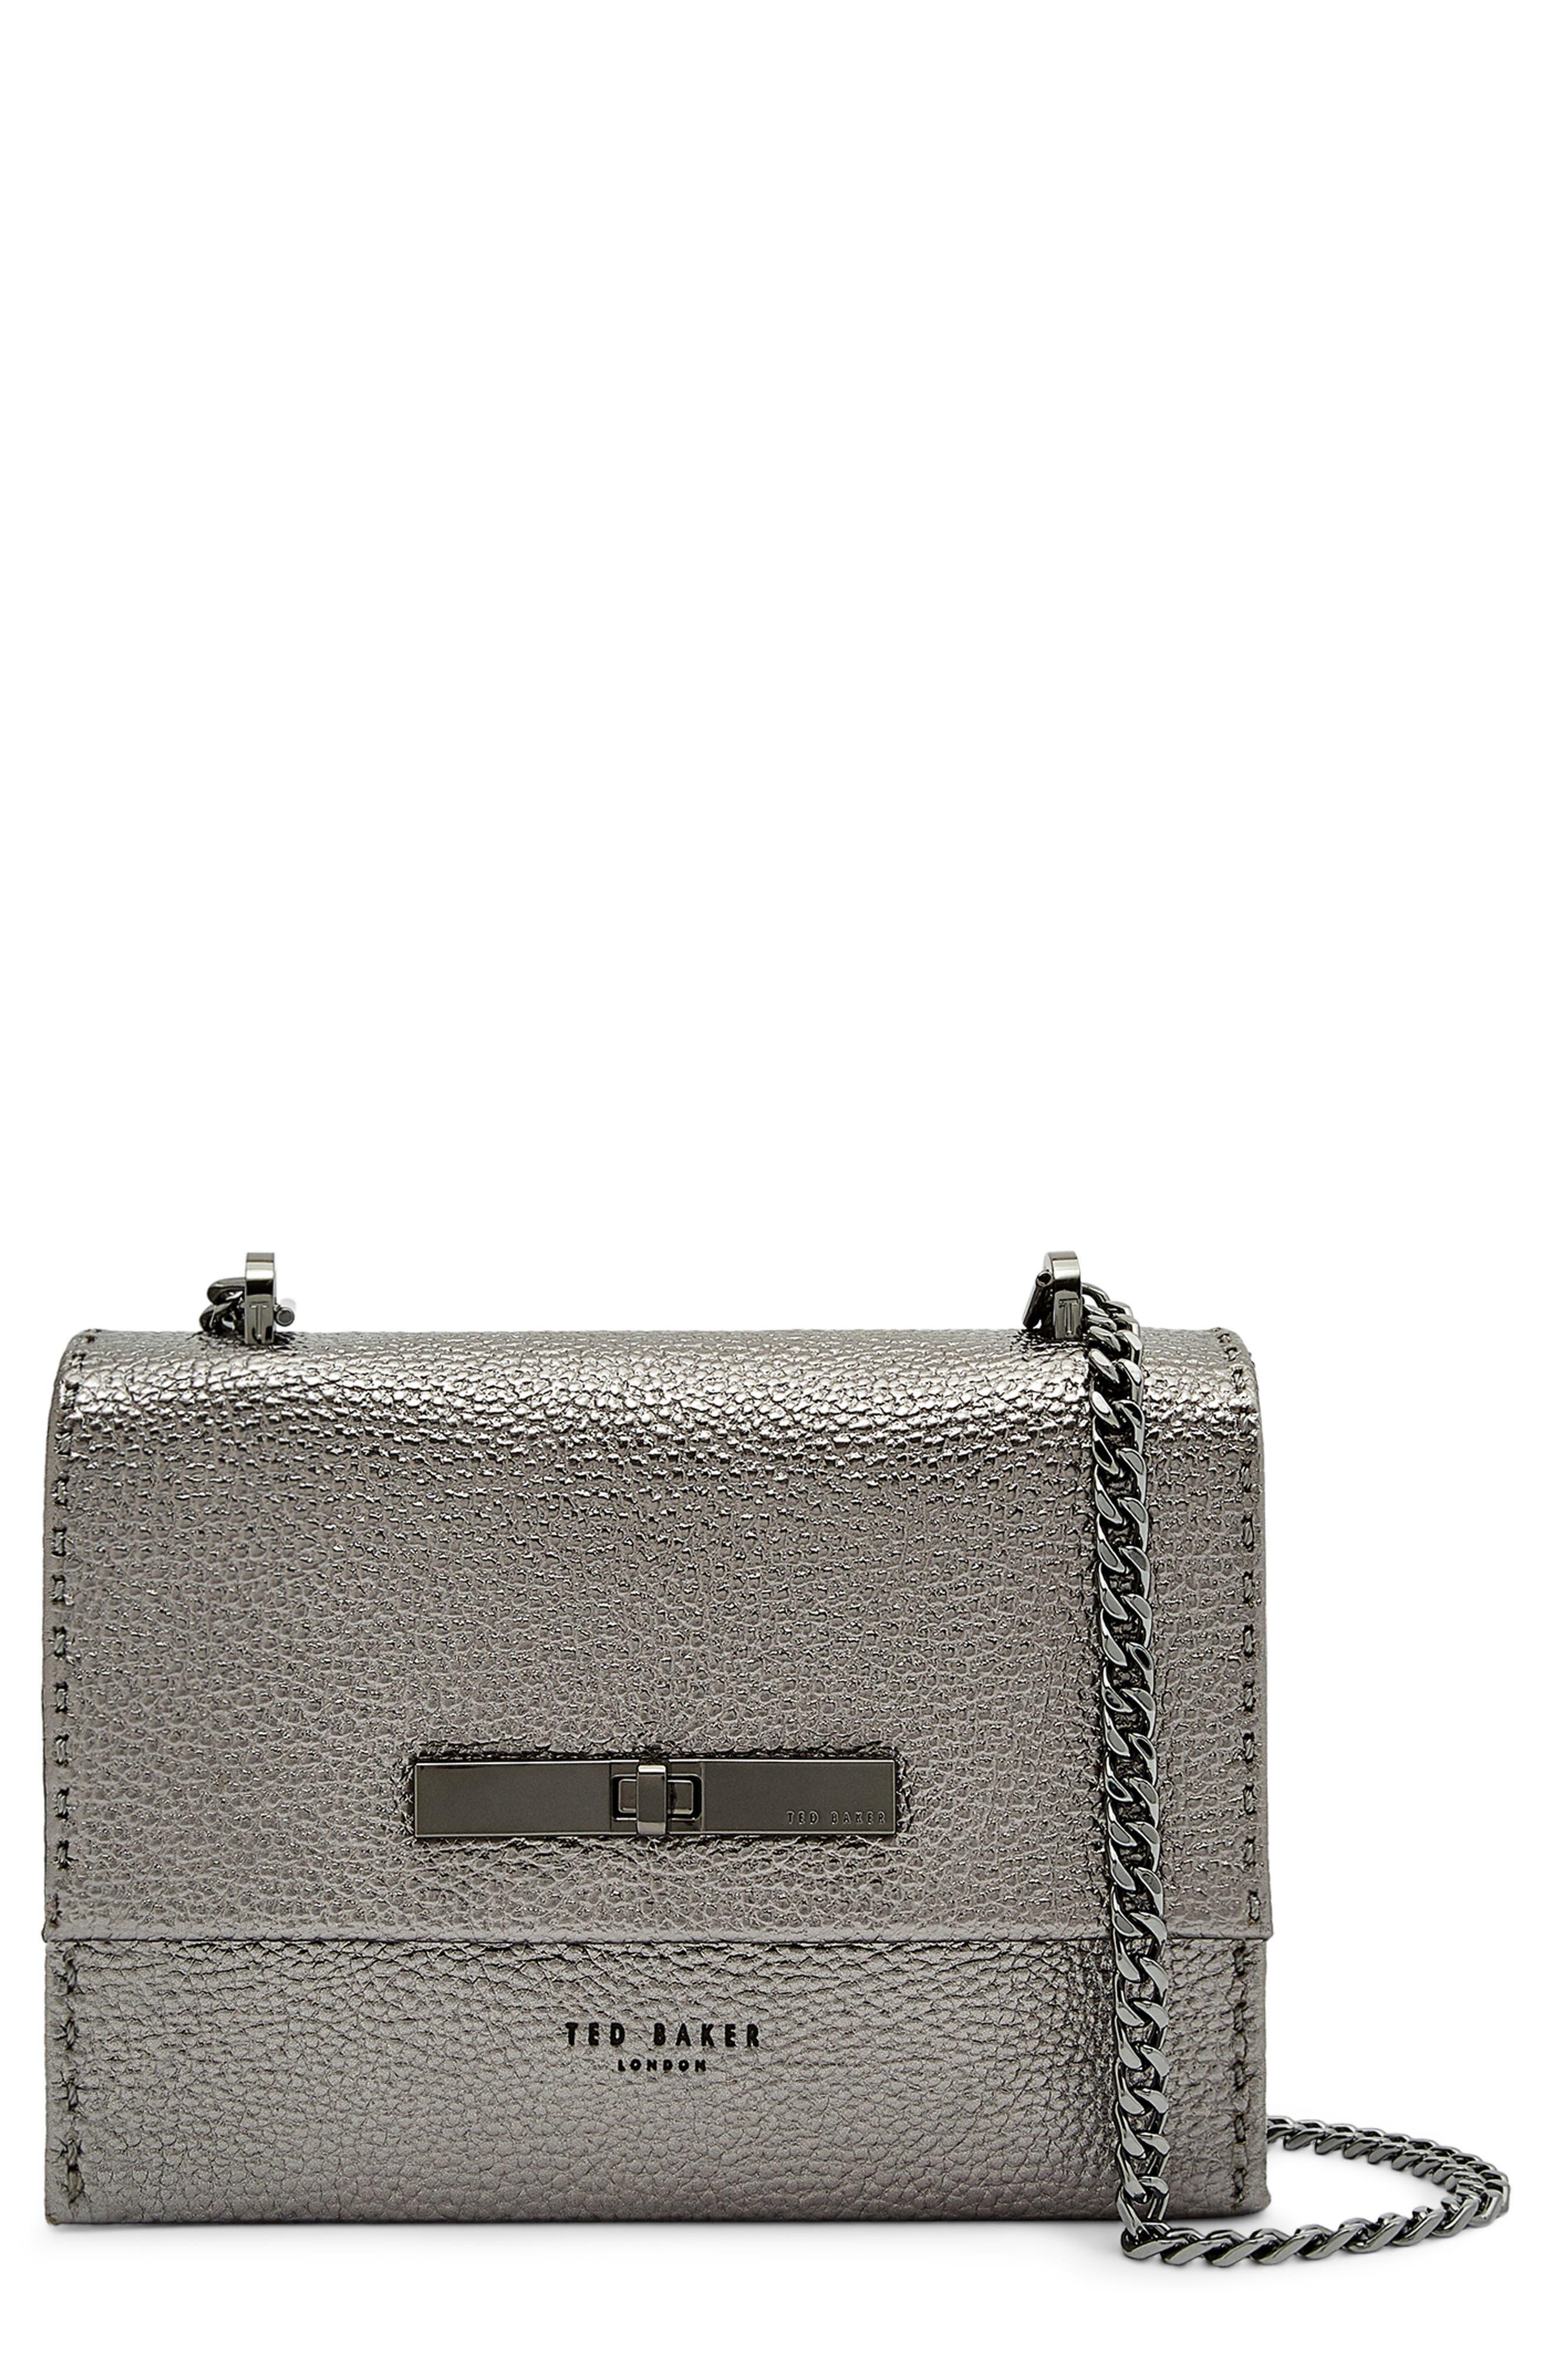 cfa2a12d5246 Ted Baker Mini Juliah Concertina Leather Crossbody Bag - Grey In Gunmetal